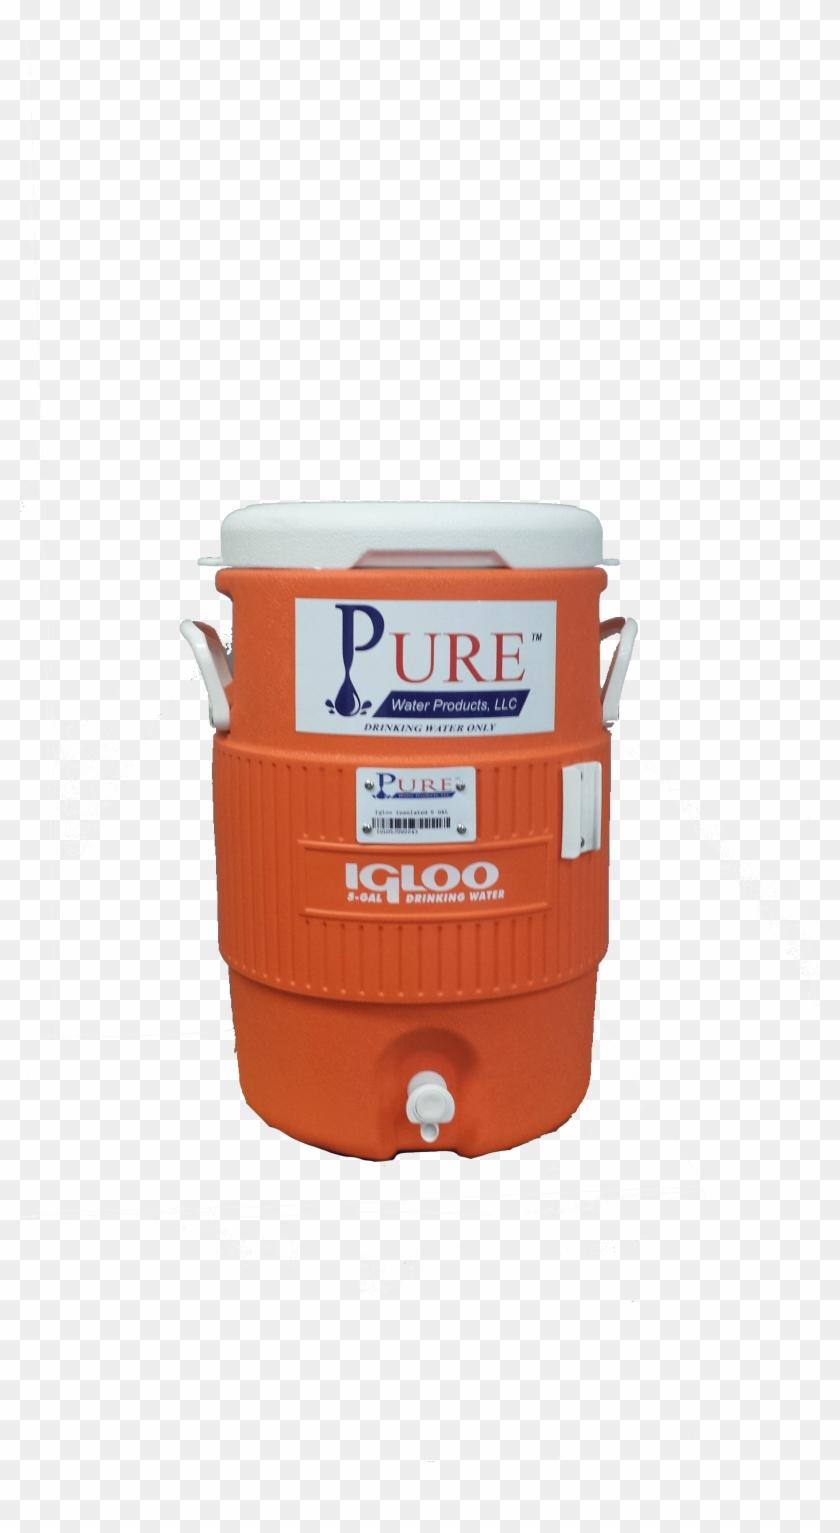 Gallon PNG - Gallon Of Water, Gallon Jug, 5 Gallon Bucket, Ten Gallon Hat,  Gallon Of Gas, Milk 1 2 Gallon, Gallon Milk Jug. - CleanPNG / KissPNG